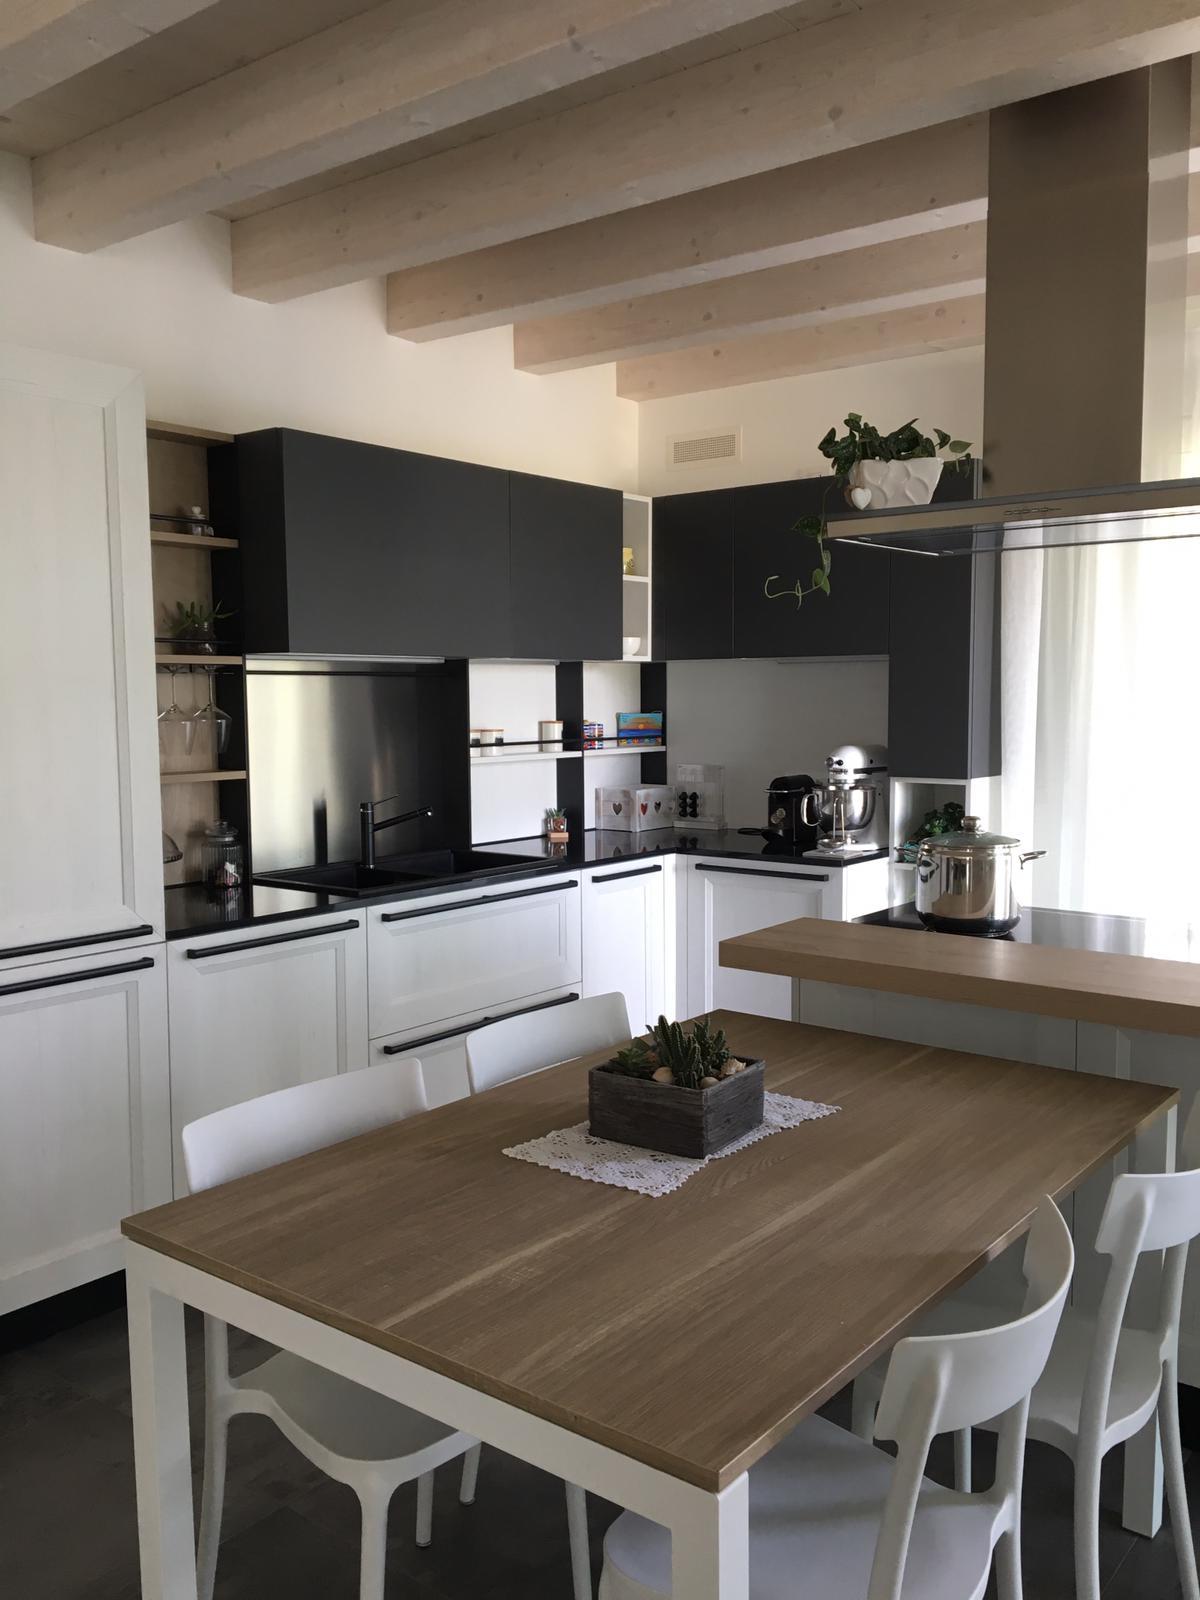 Cucina -TABLET- Veneta Cucine